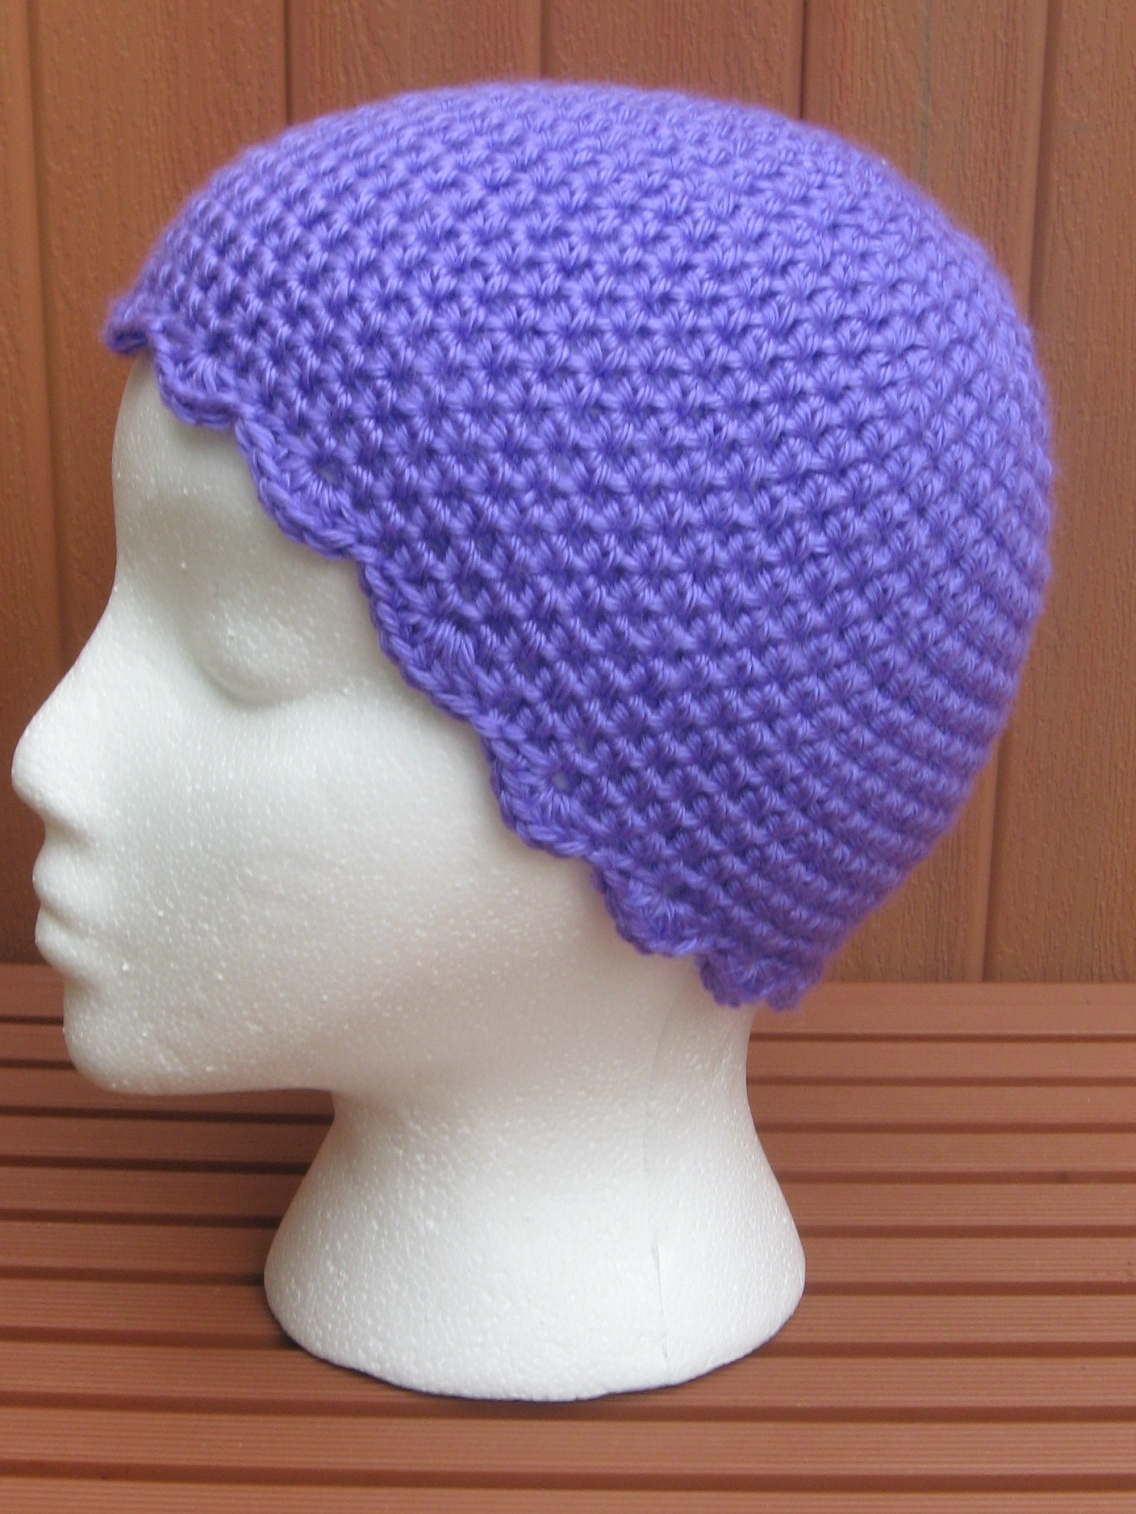 Crochet Projects  Crochet Chemo Sleep Cap f8dc17908f5